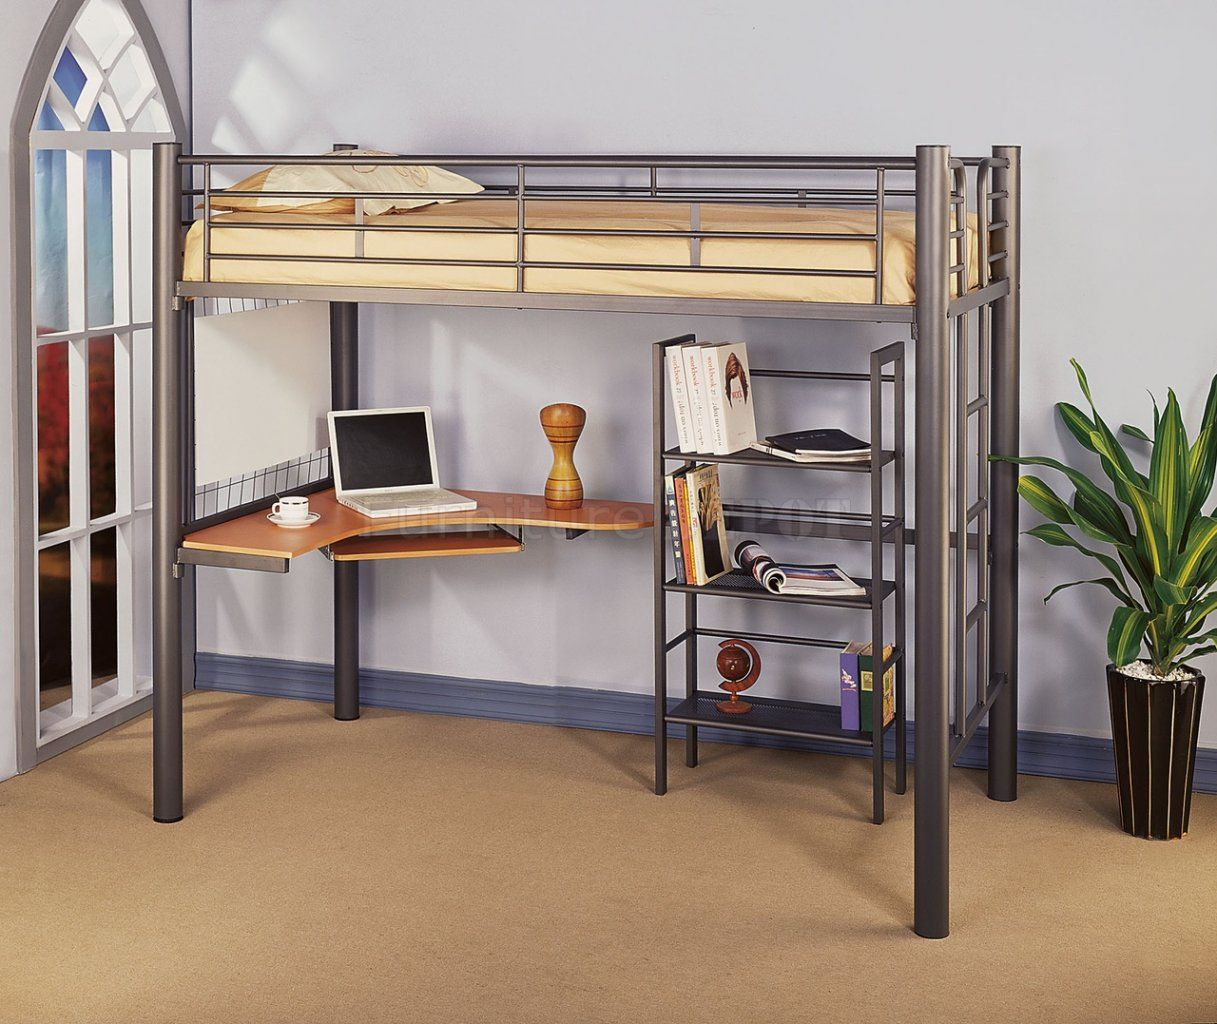 p furniture edison loft company over metal hdtotmpbl bed bunk twin walker black beds rustic